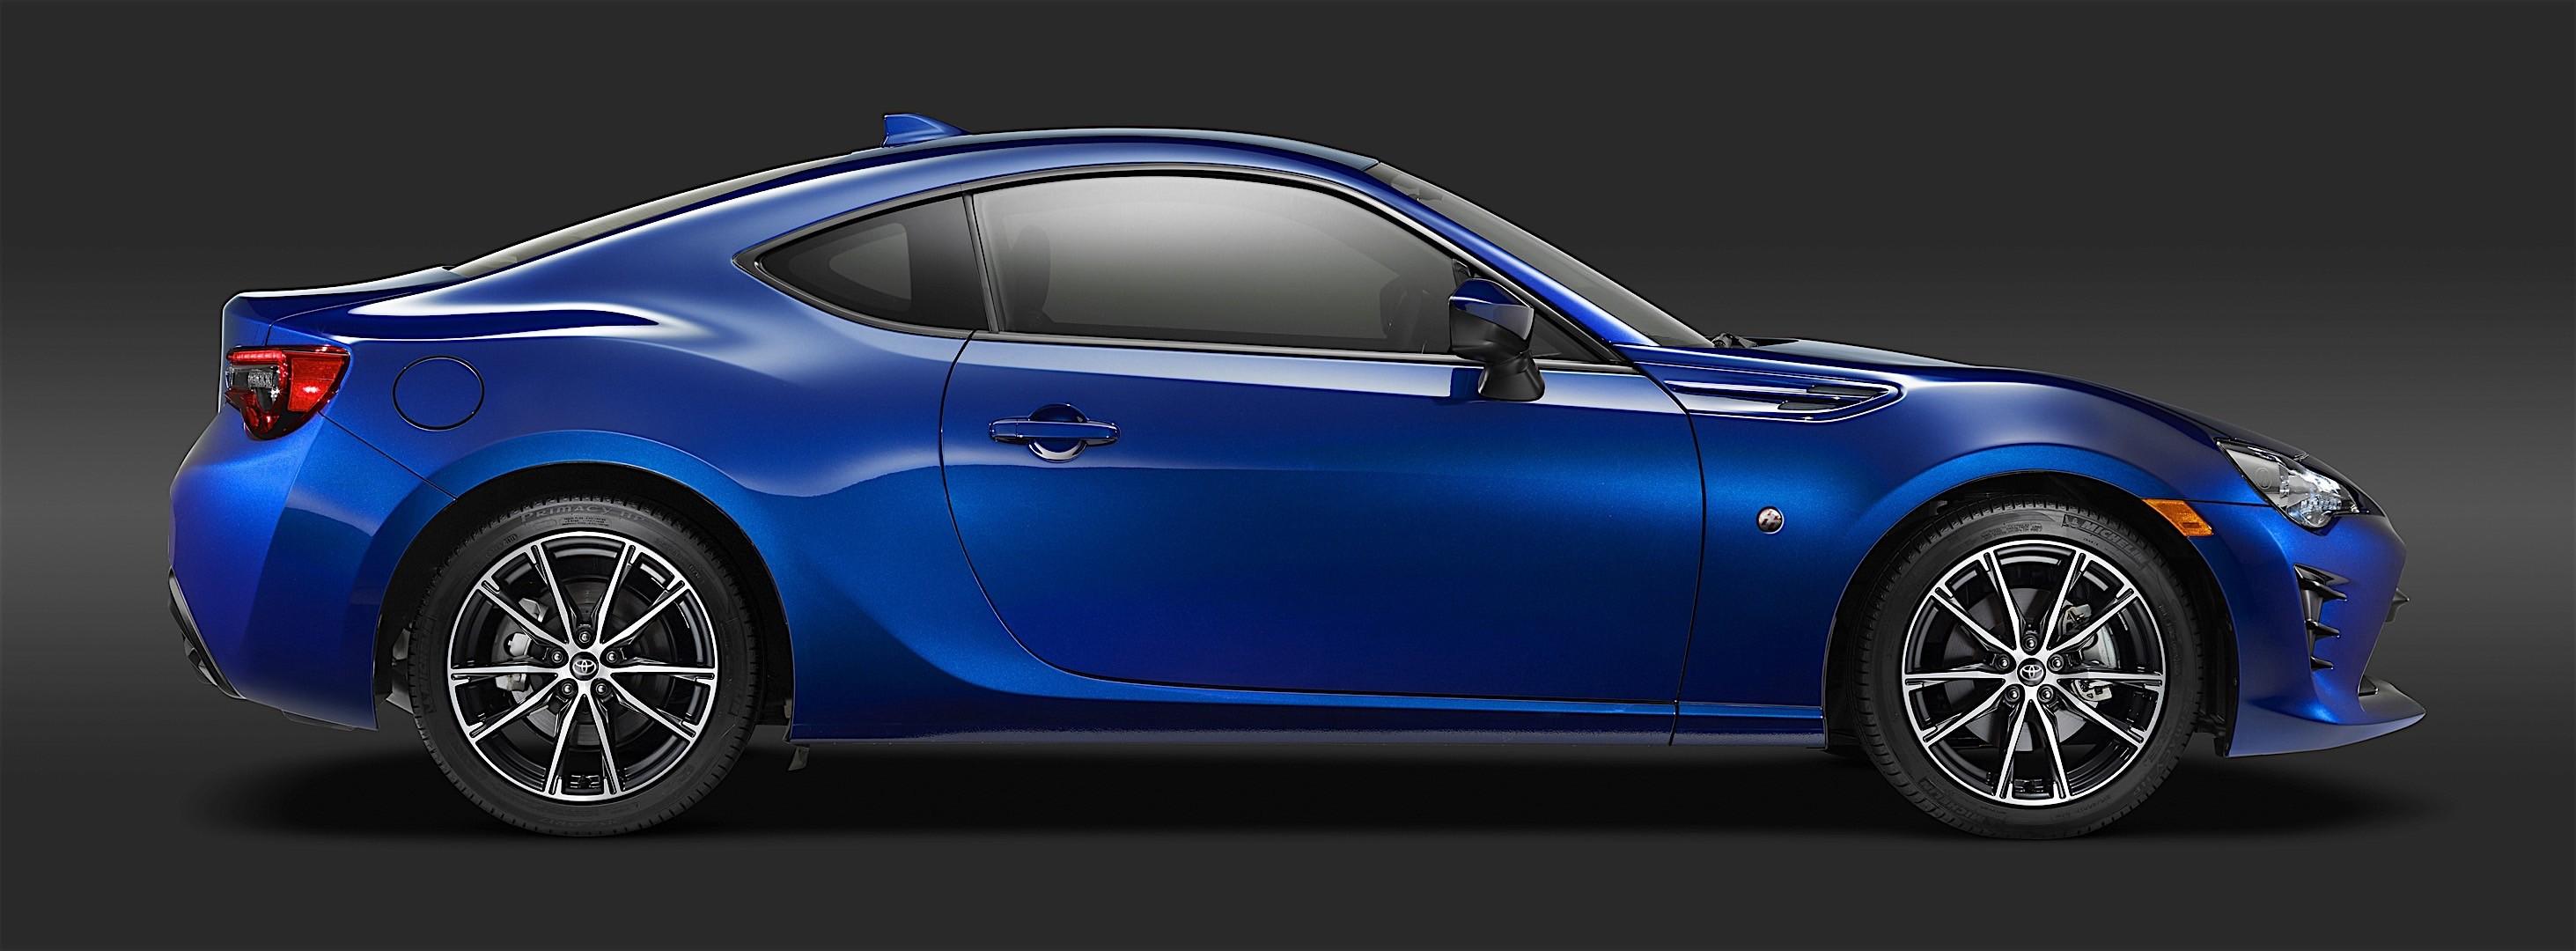 Toyota Gt 86 Specs 2016 2017 2018 Autoevolution